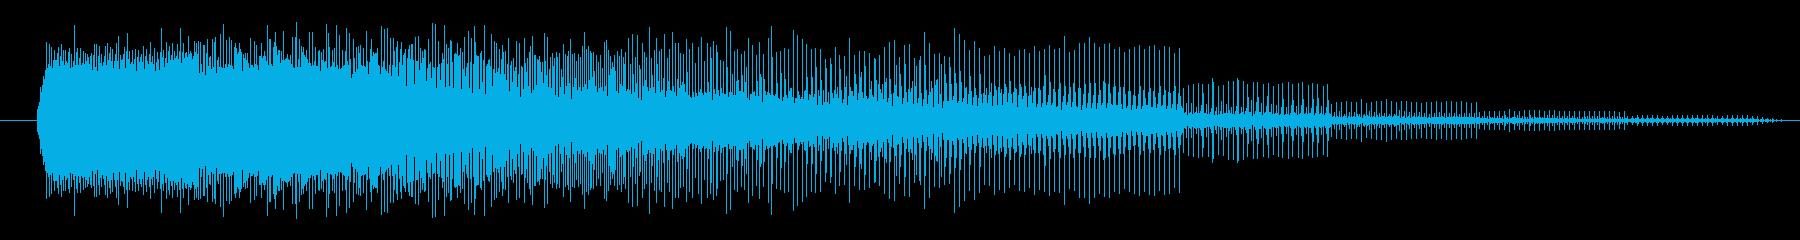 FX 合成ビームローディング01の再生済みの波形